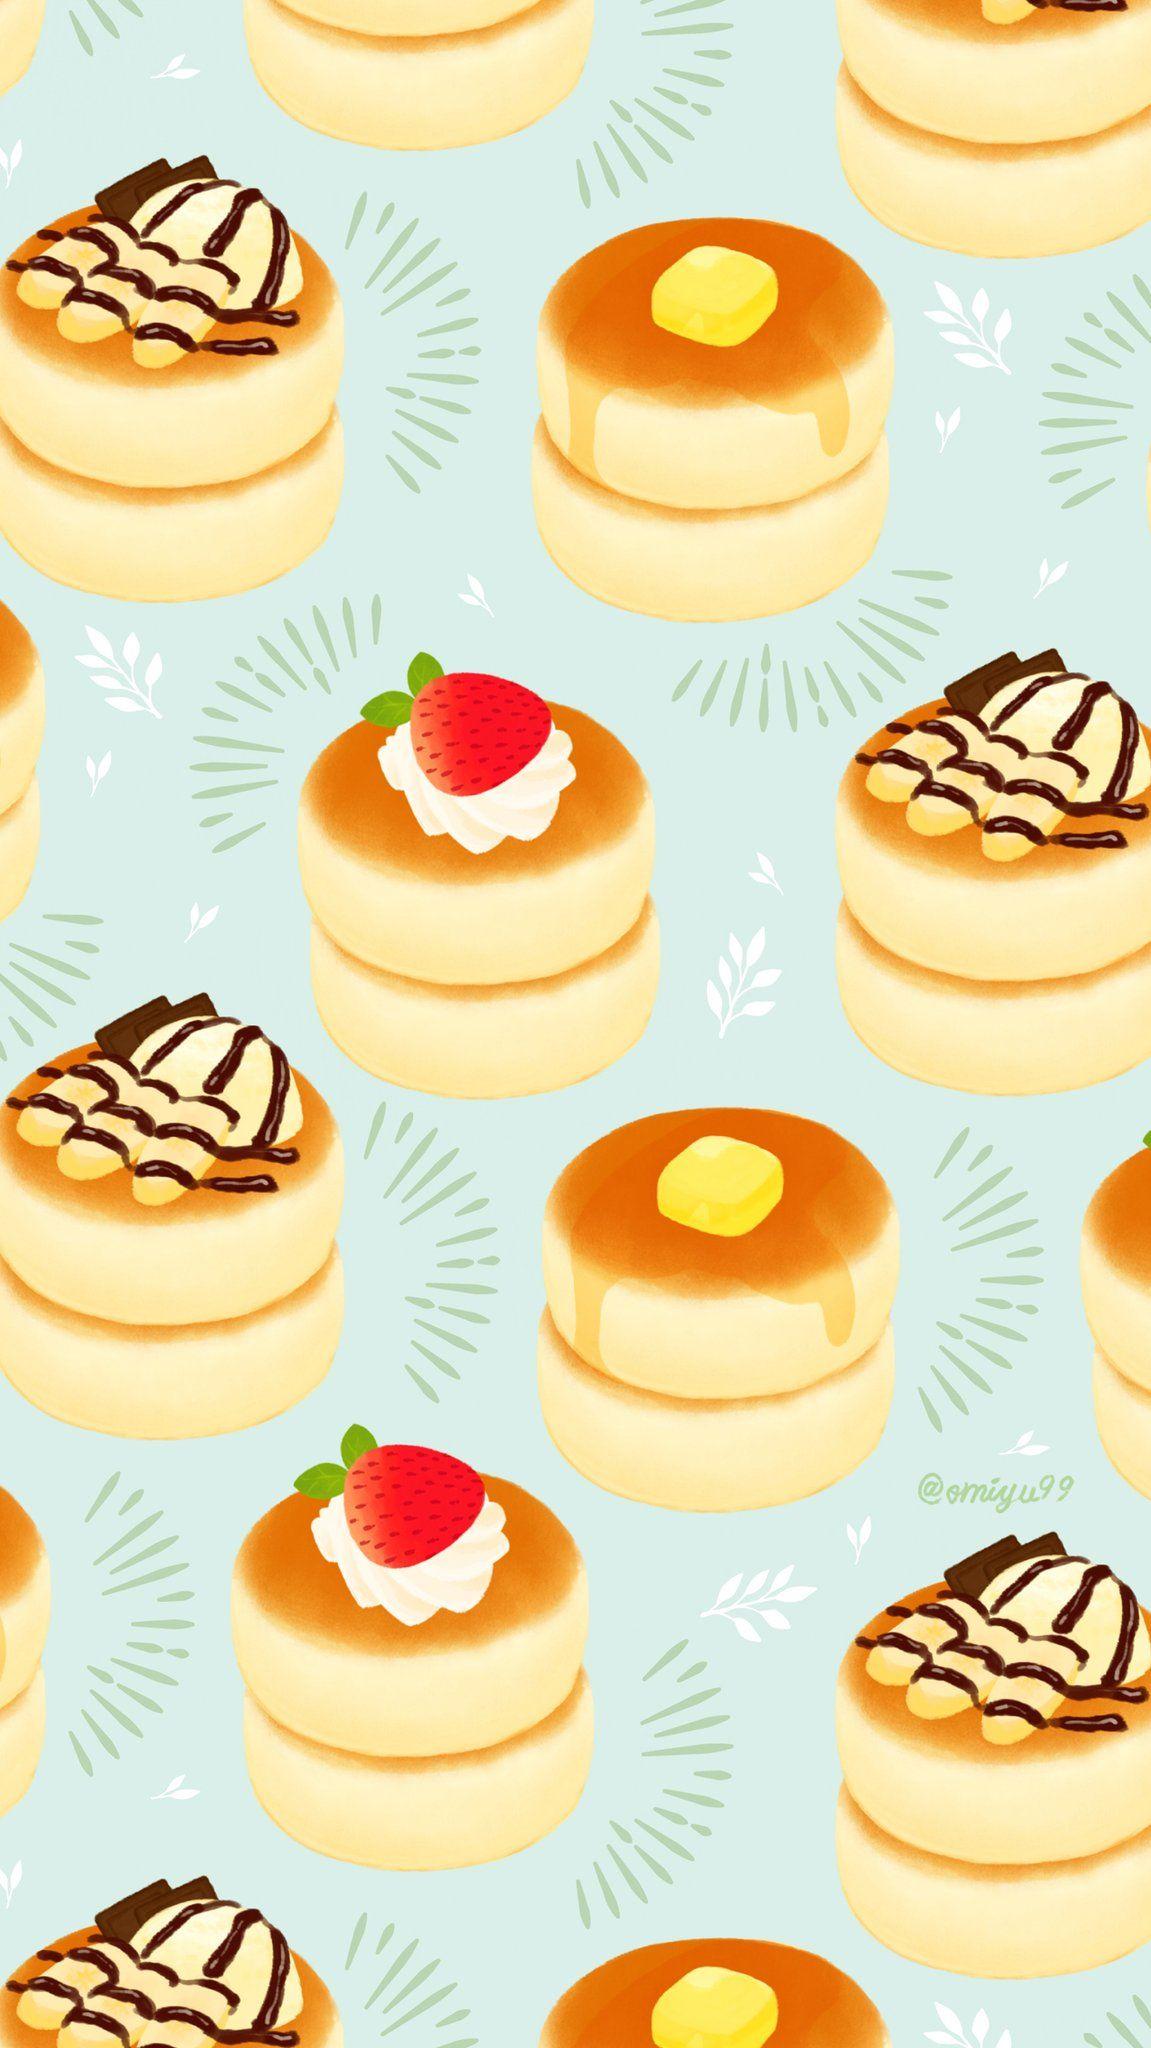 Omiyu みゆき In Food Wallpaper Food Doodles Cute Food Art